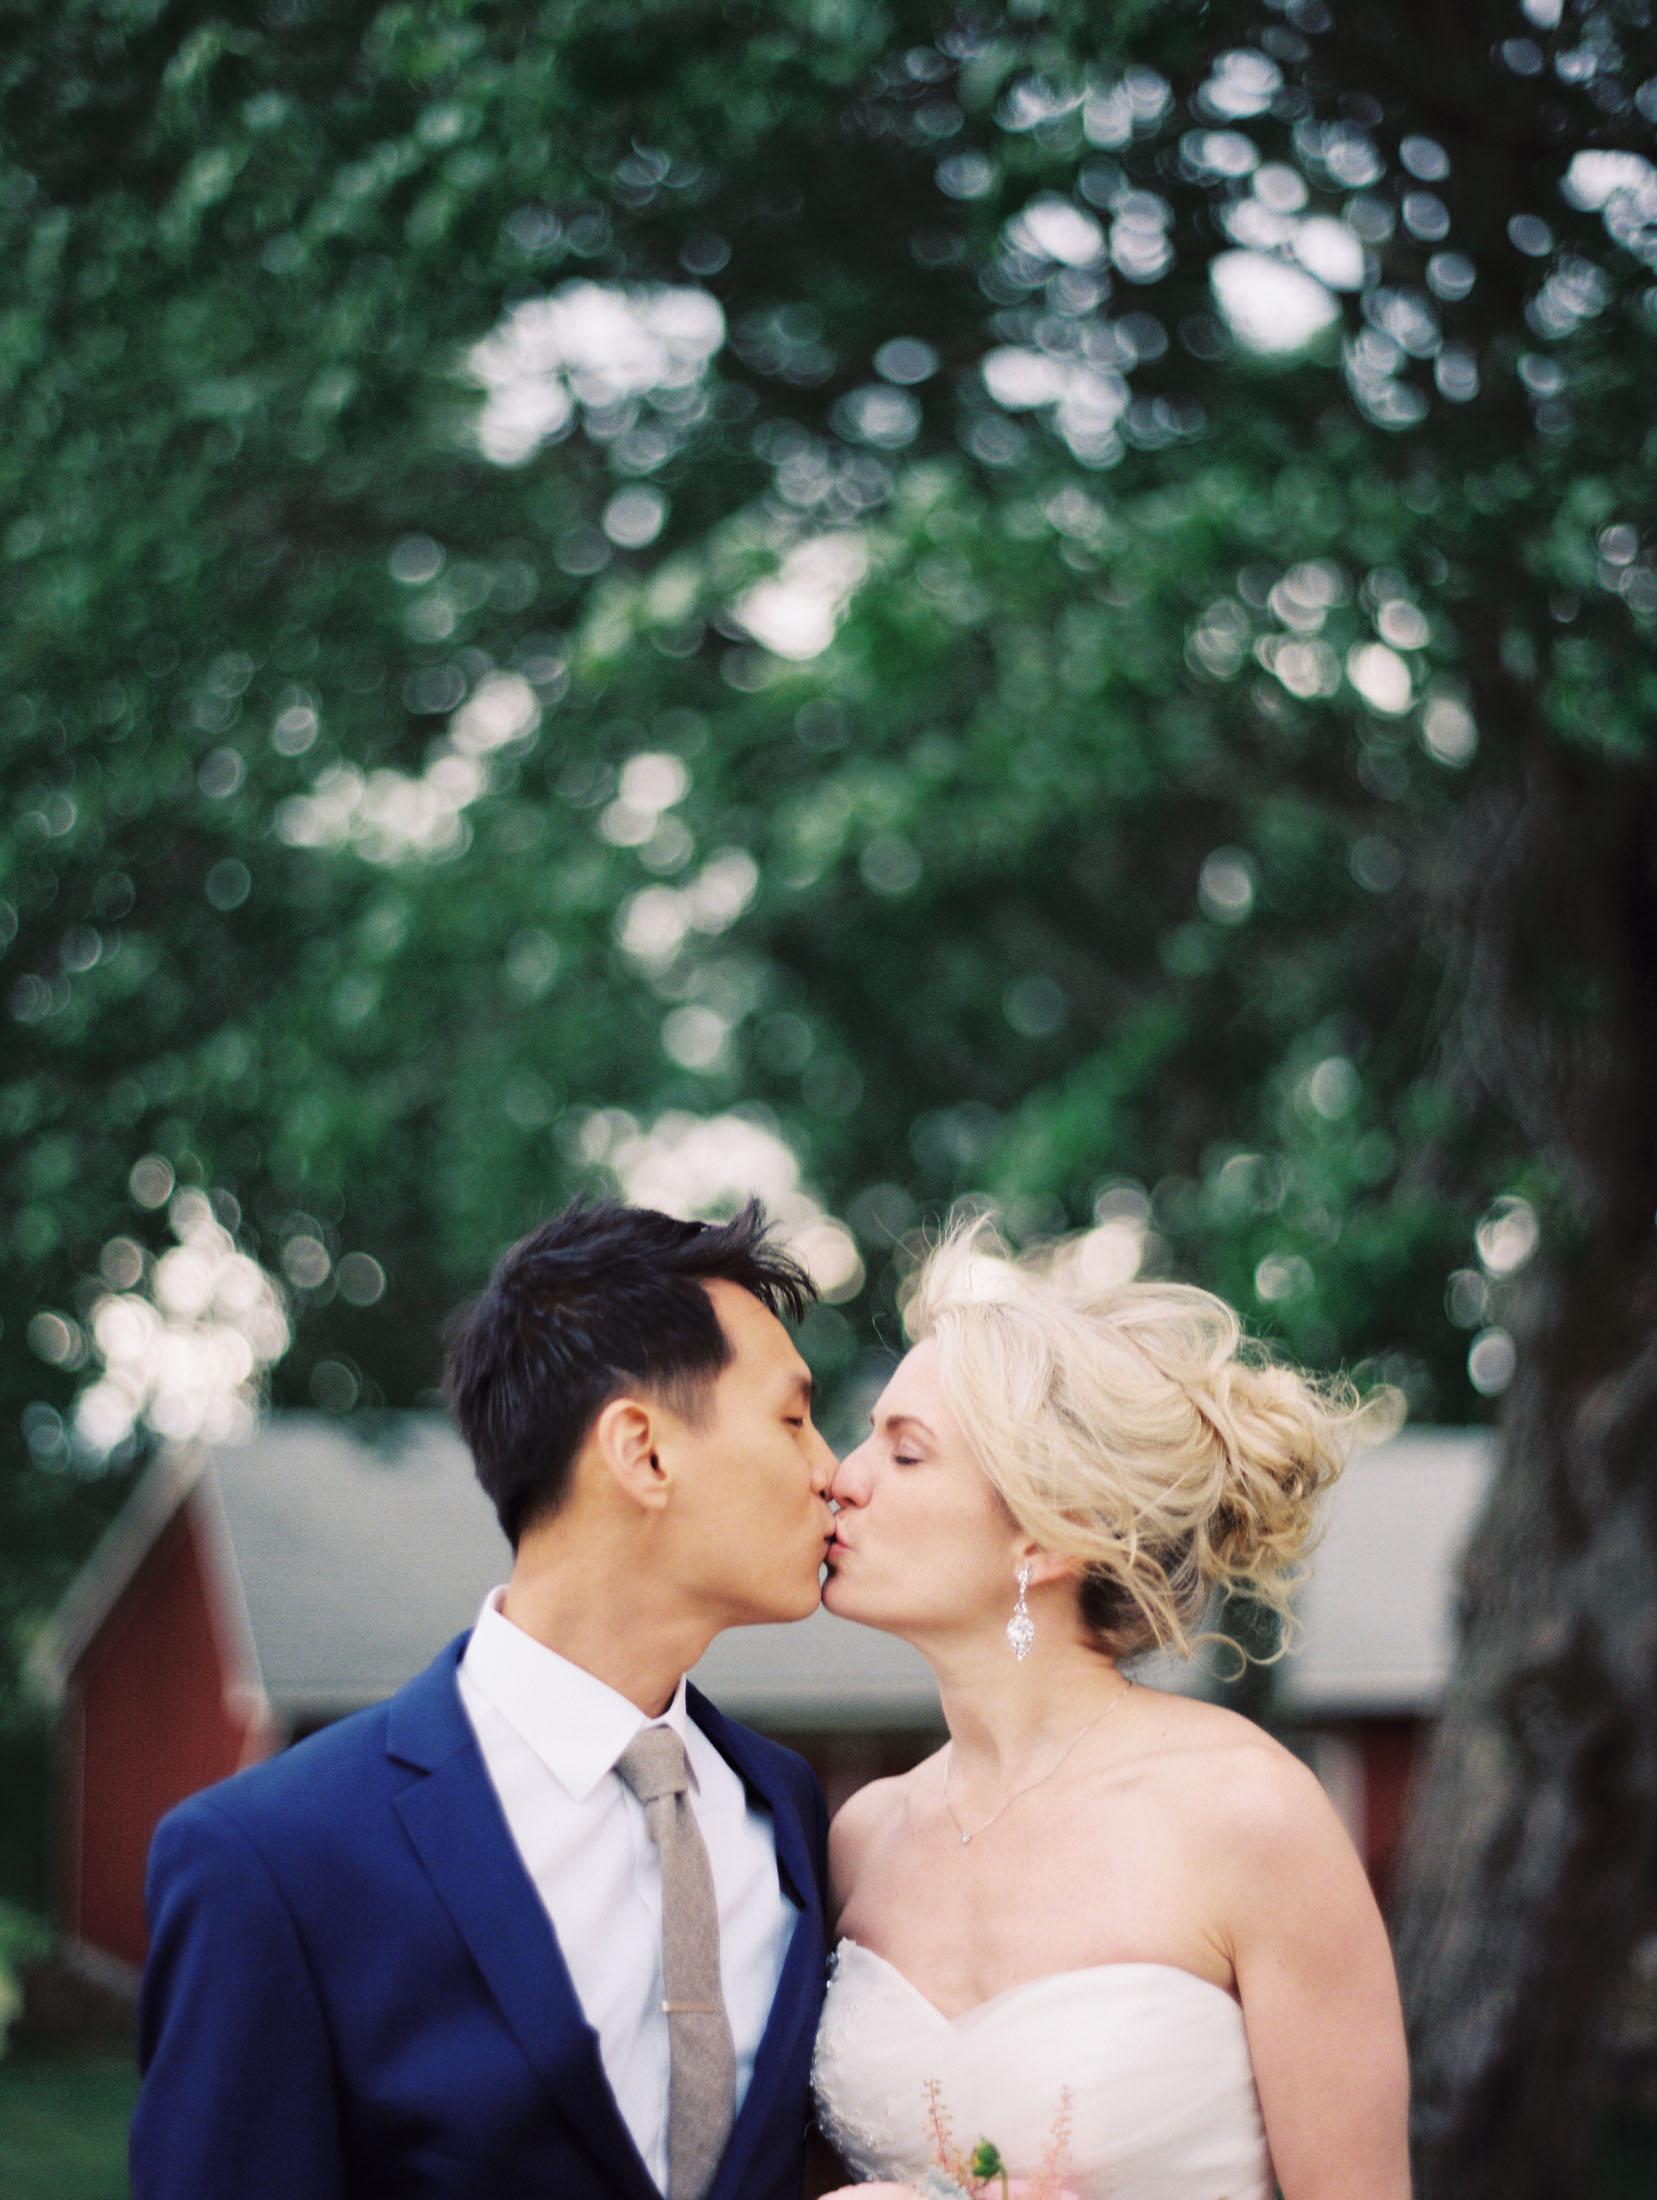 Blissful-Meadows-wedding-15.jpg